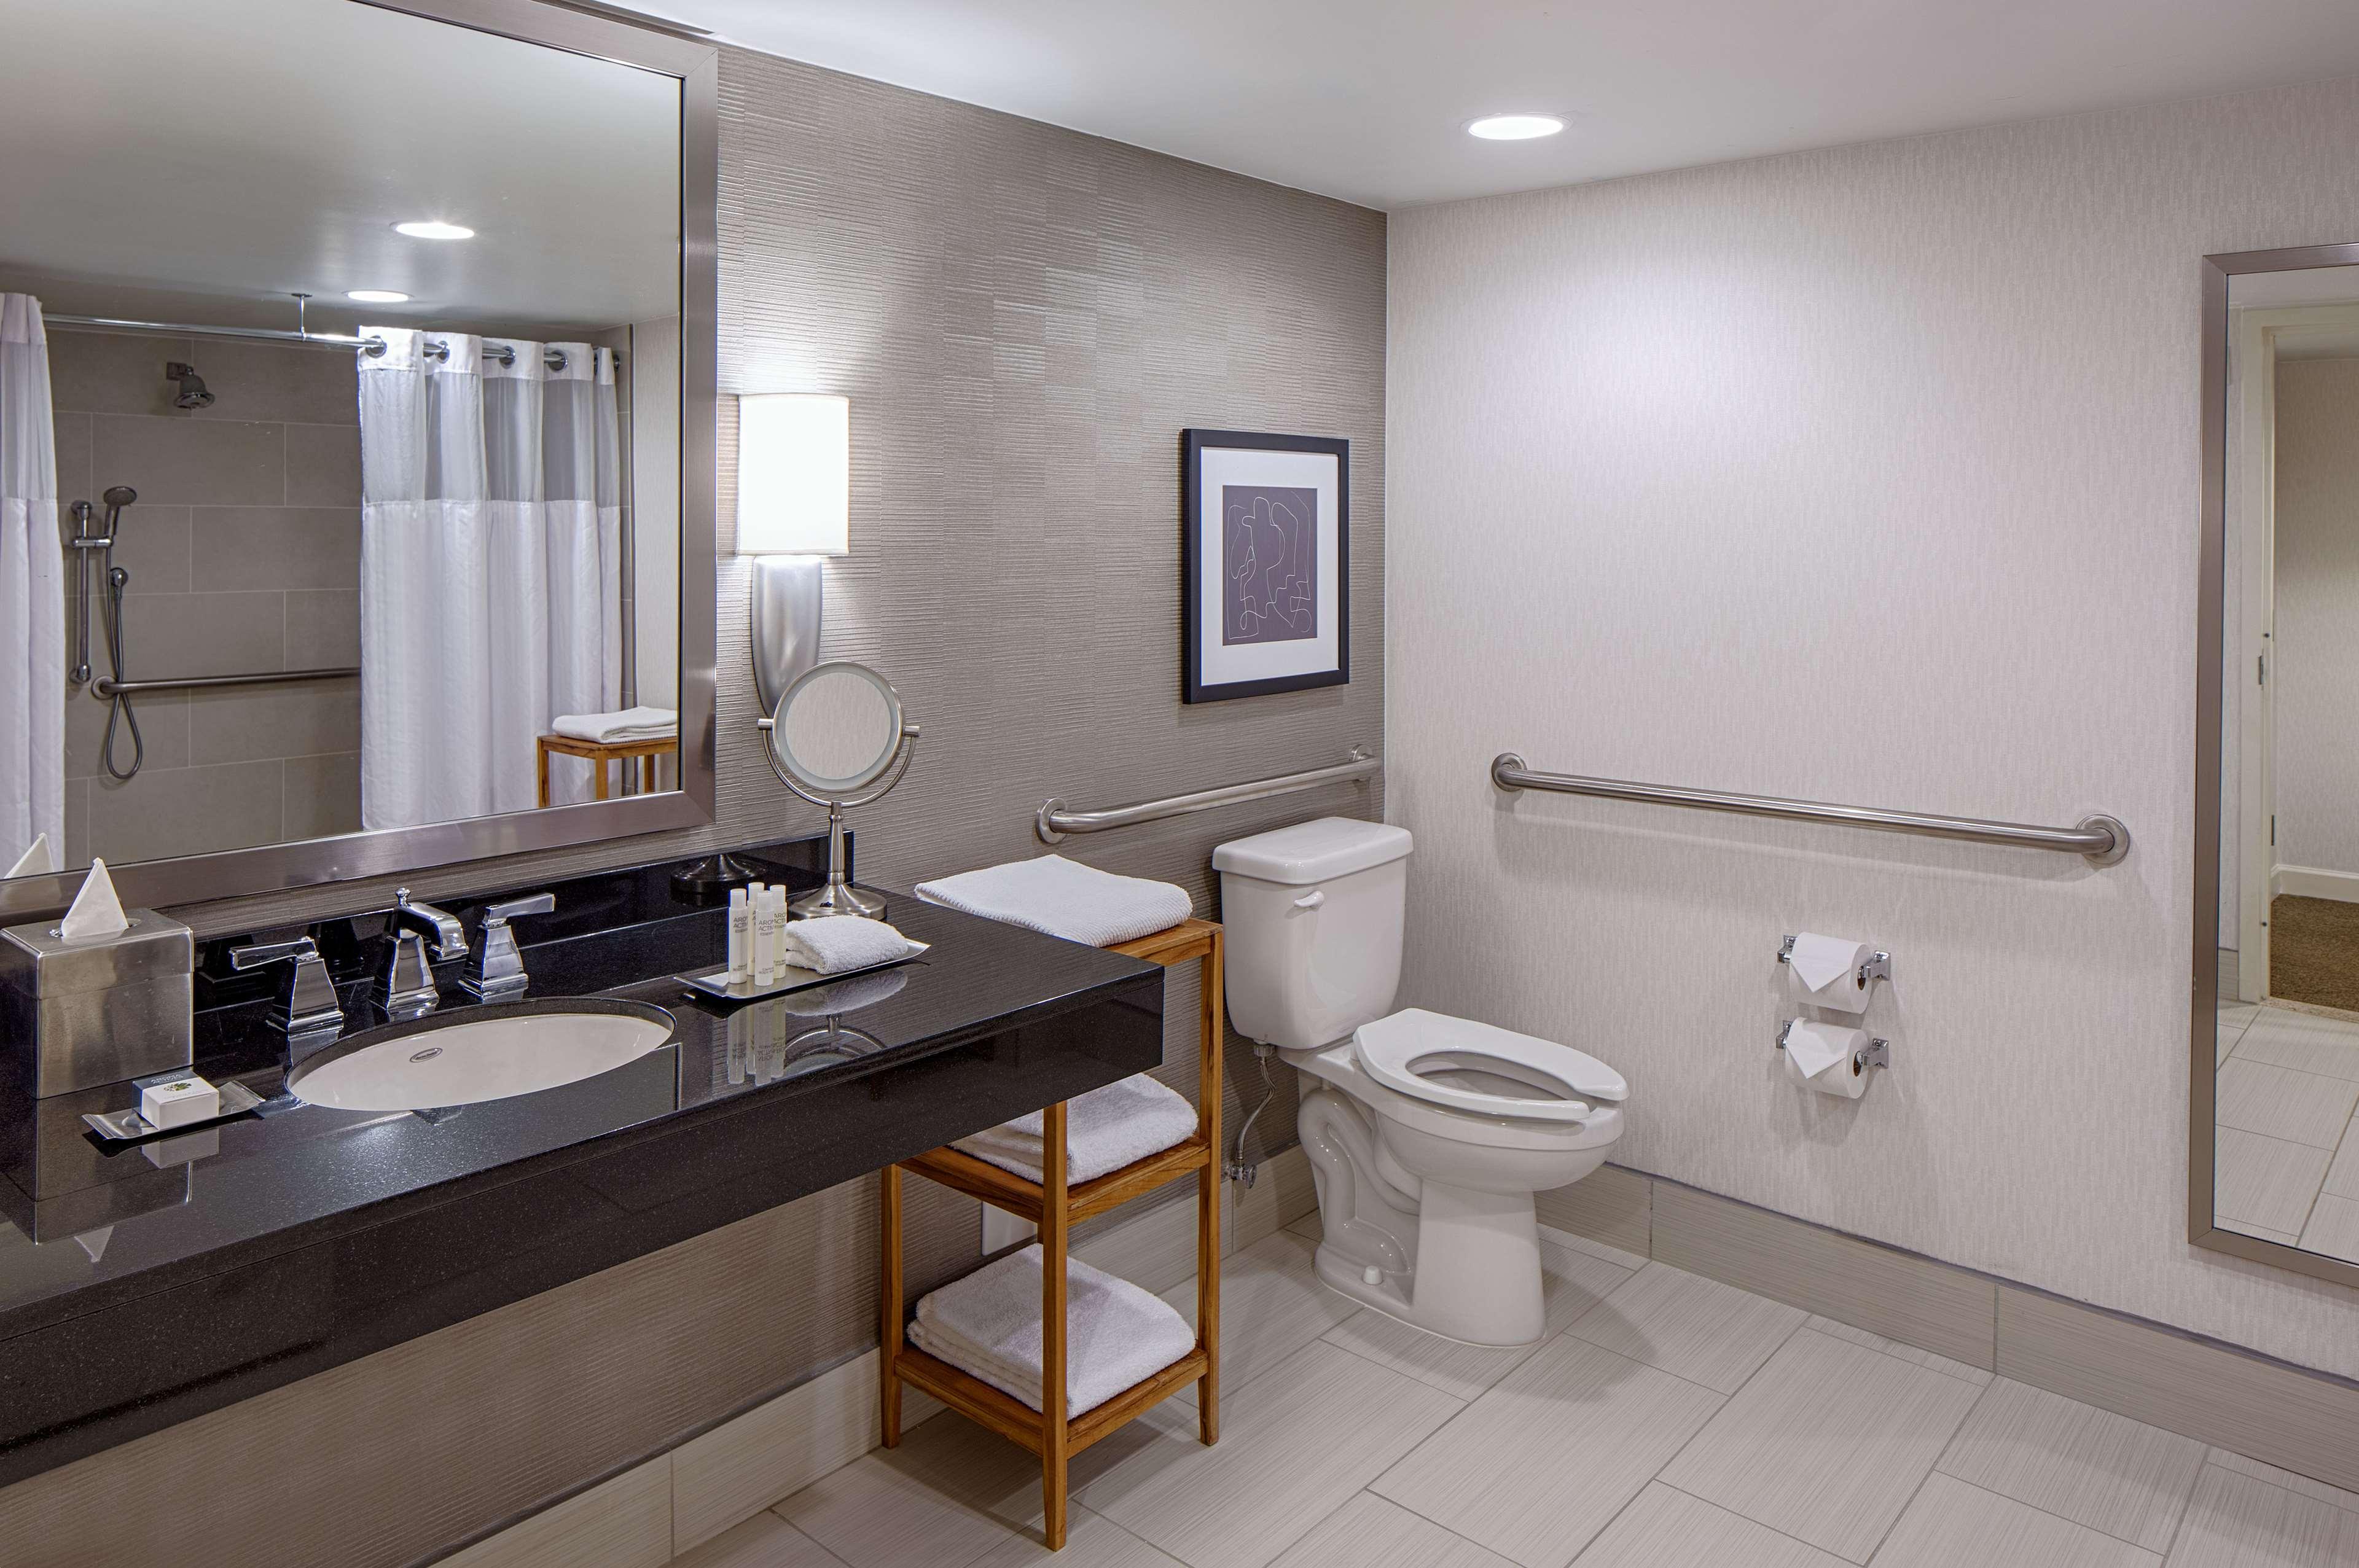 DoubleTree by Hilton Hotel Houston - Greenway Plaza image 20